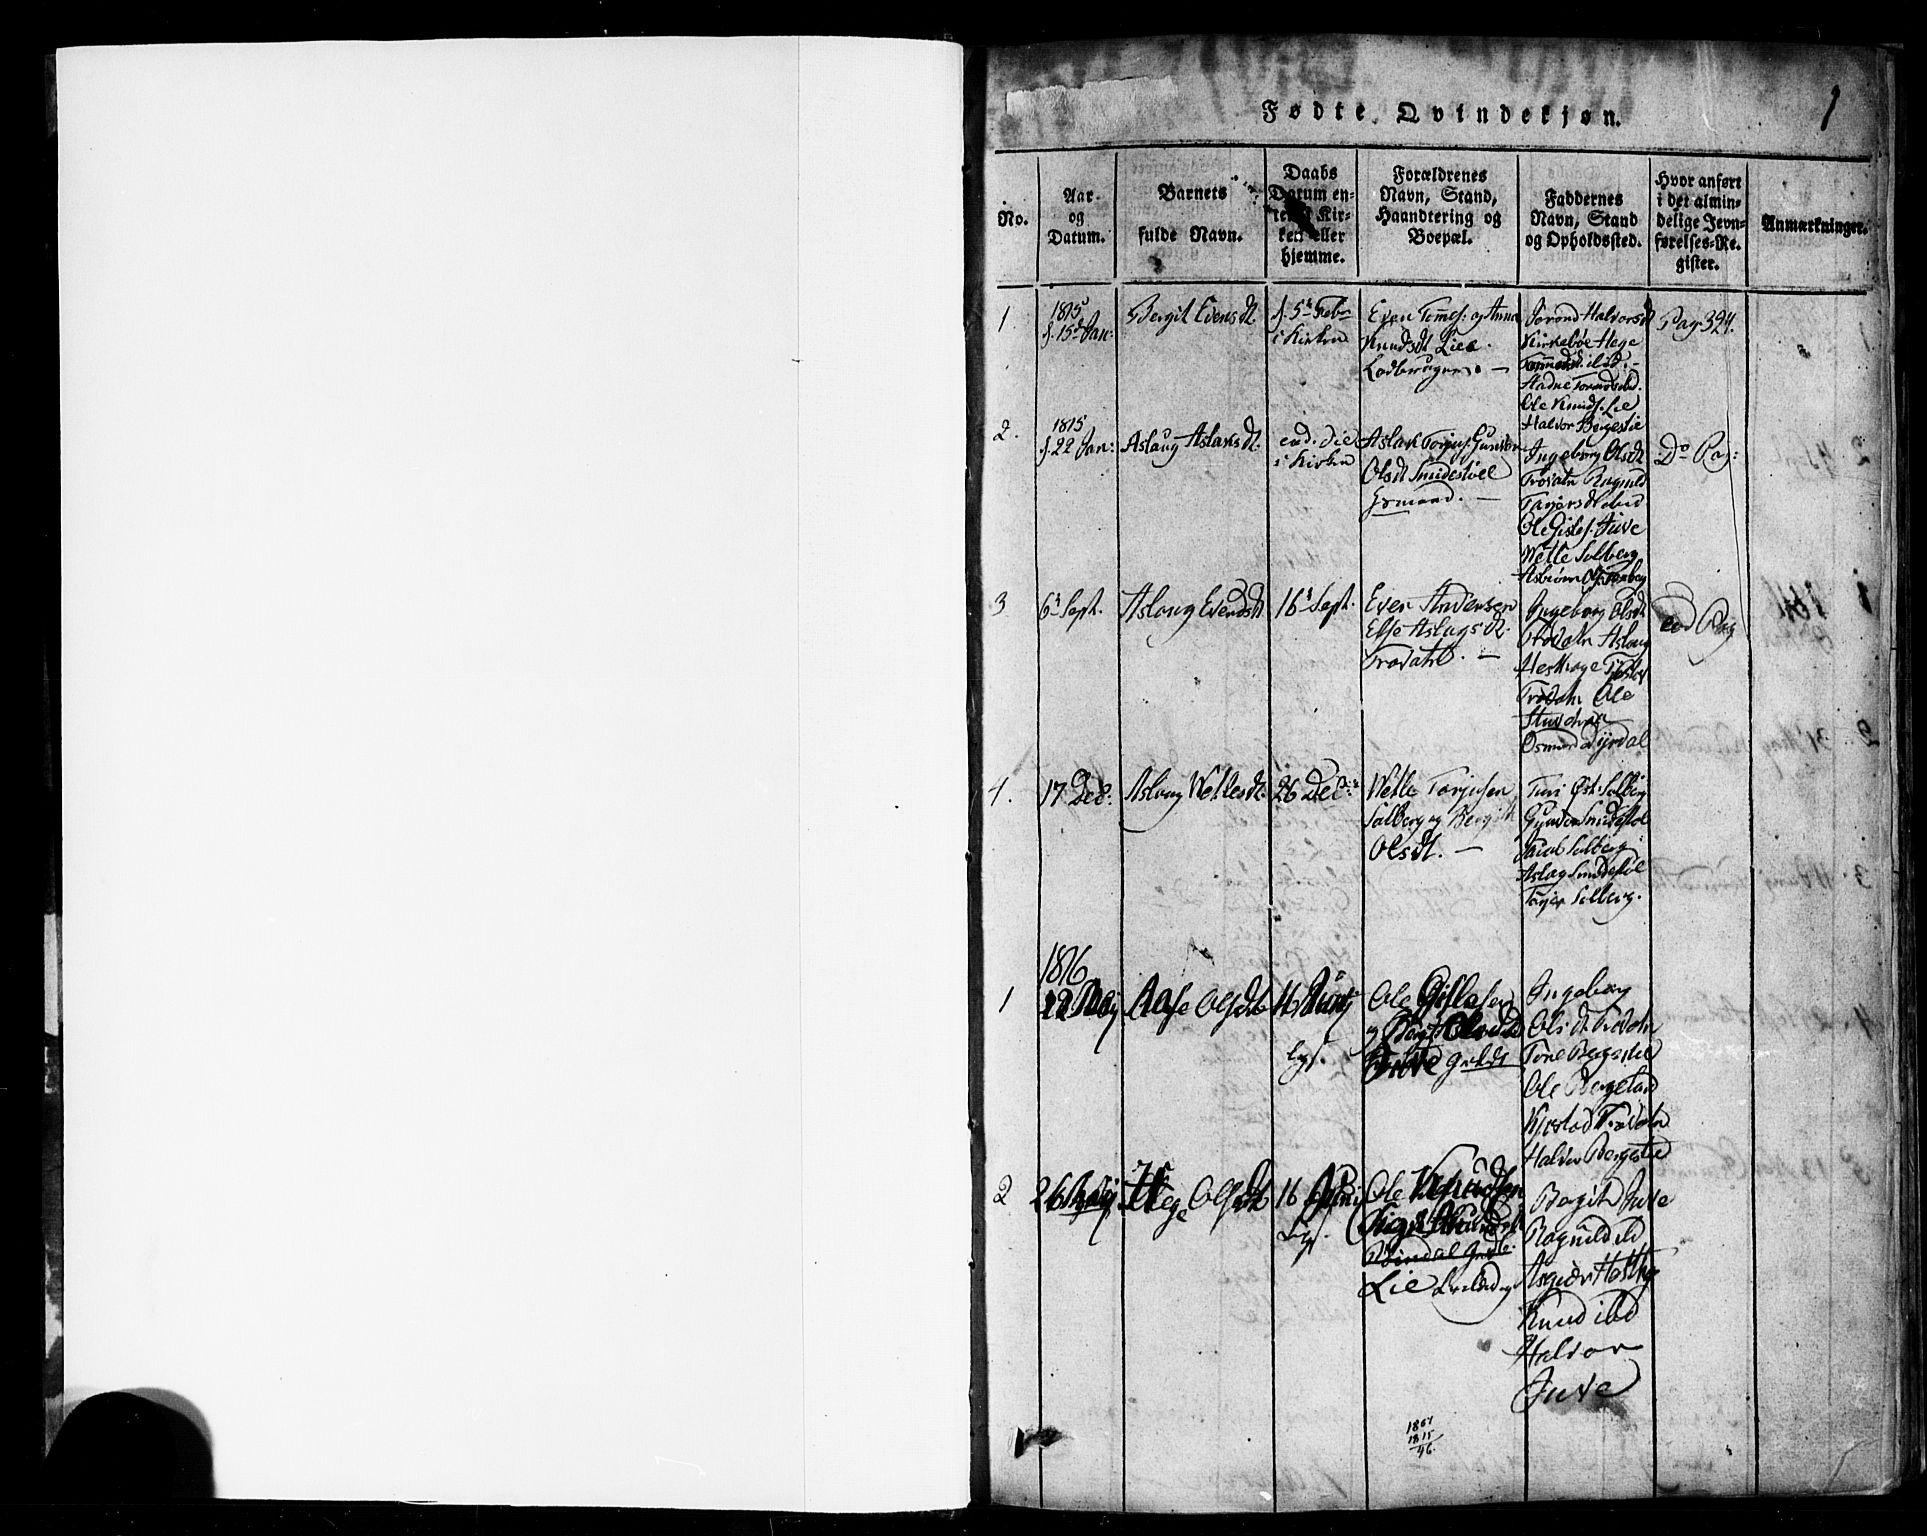 SAKO, Rauland kirkebøker, F/Fa/L0002: Ministerialbok nr. 2, 1815-1860, s. 1